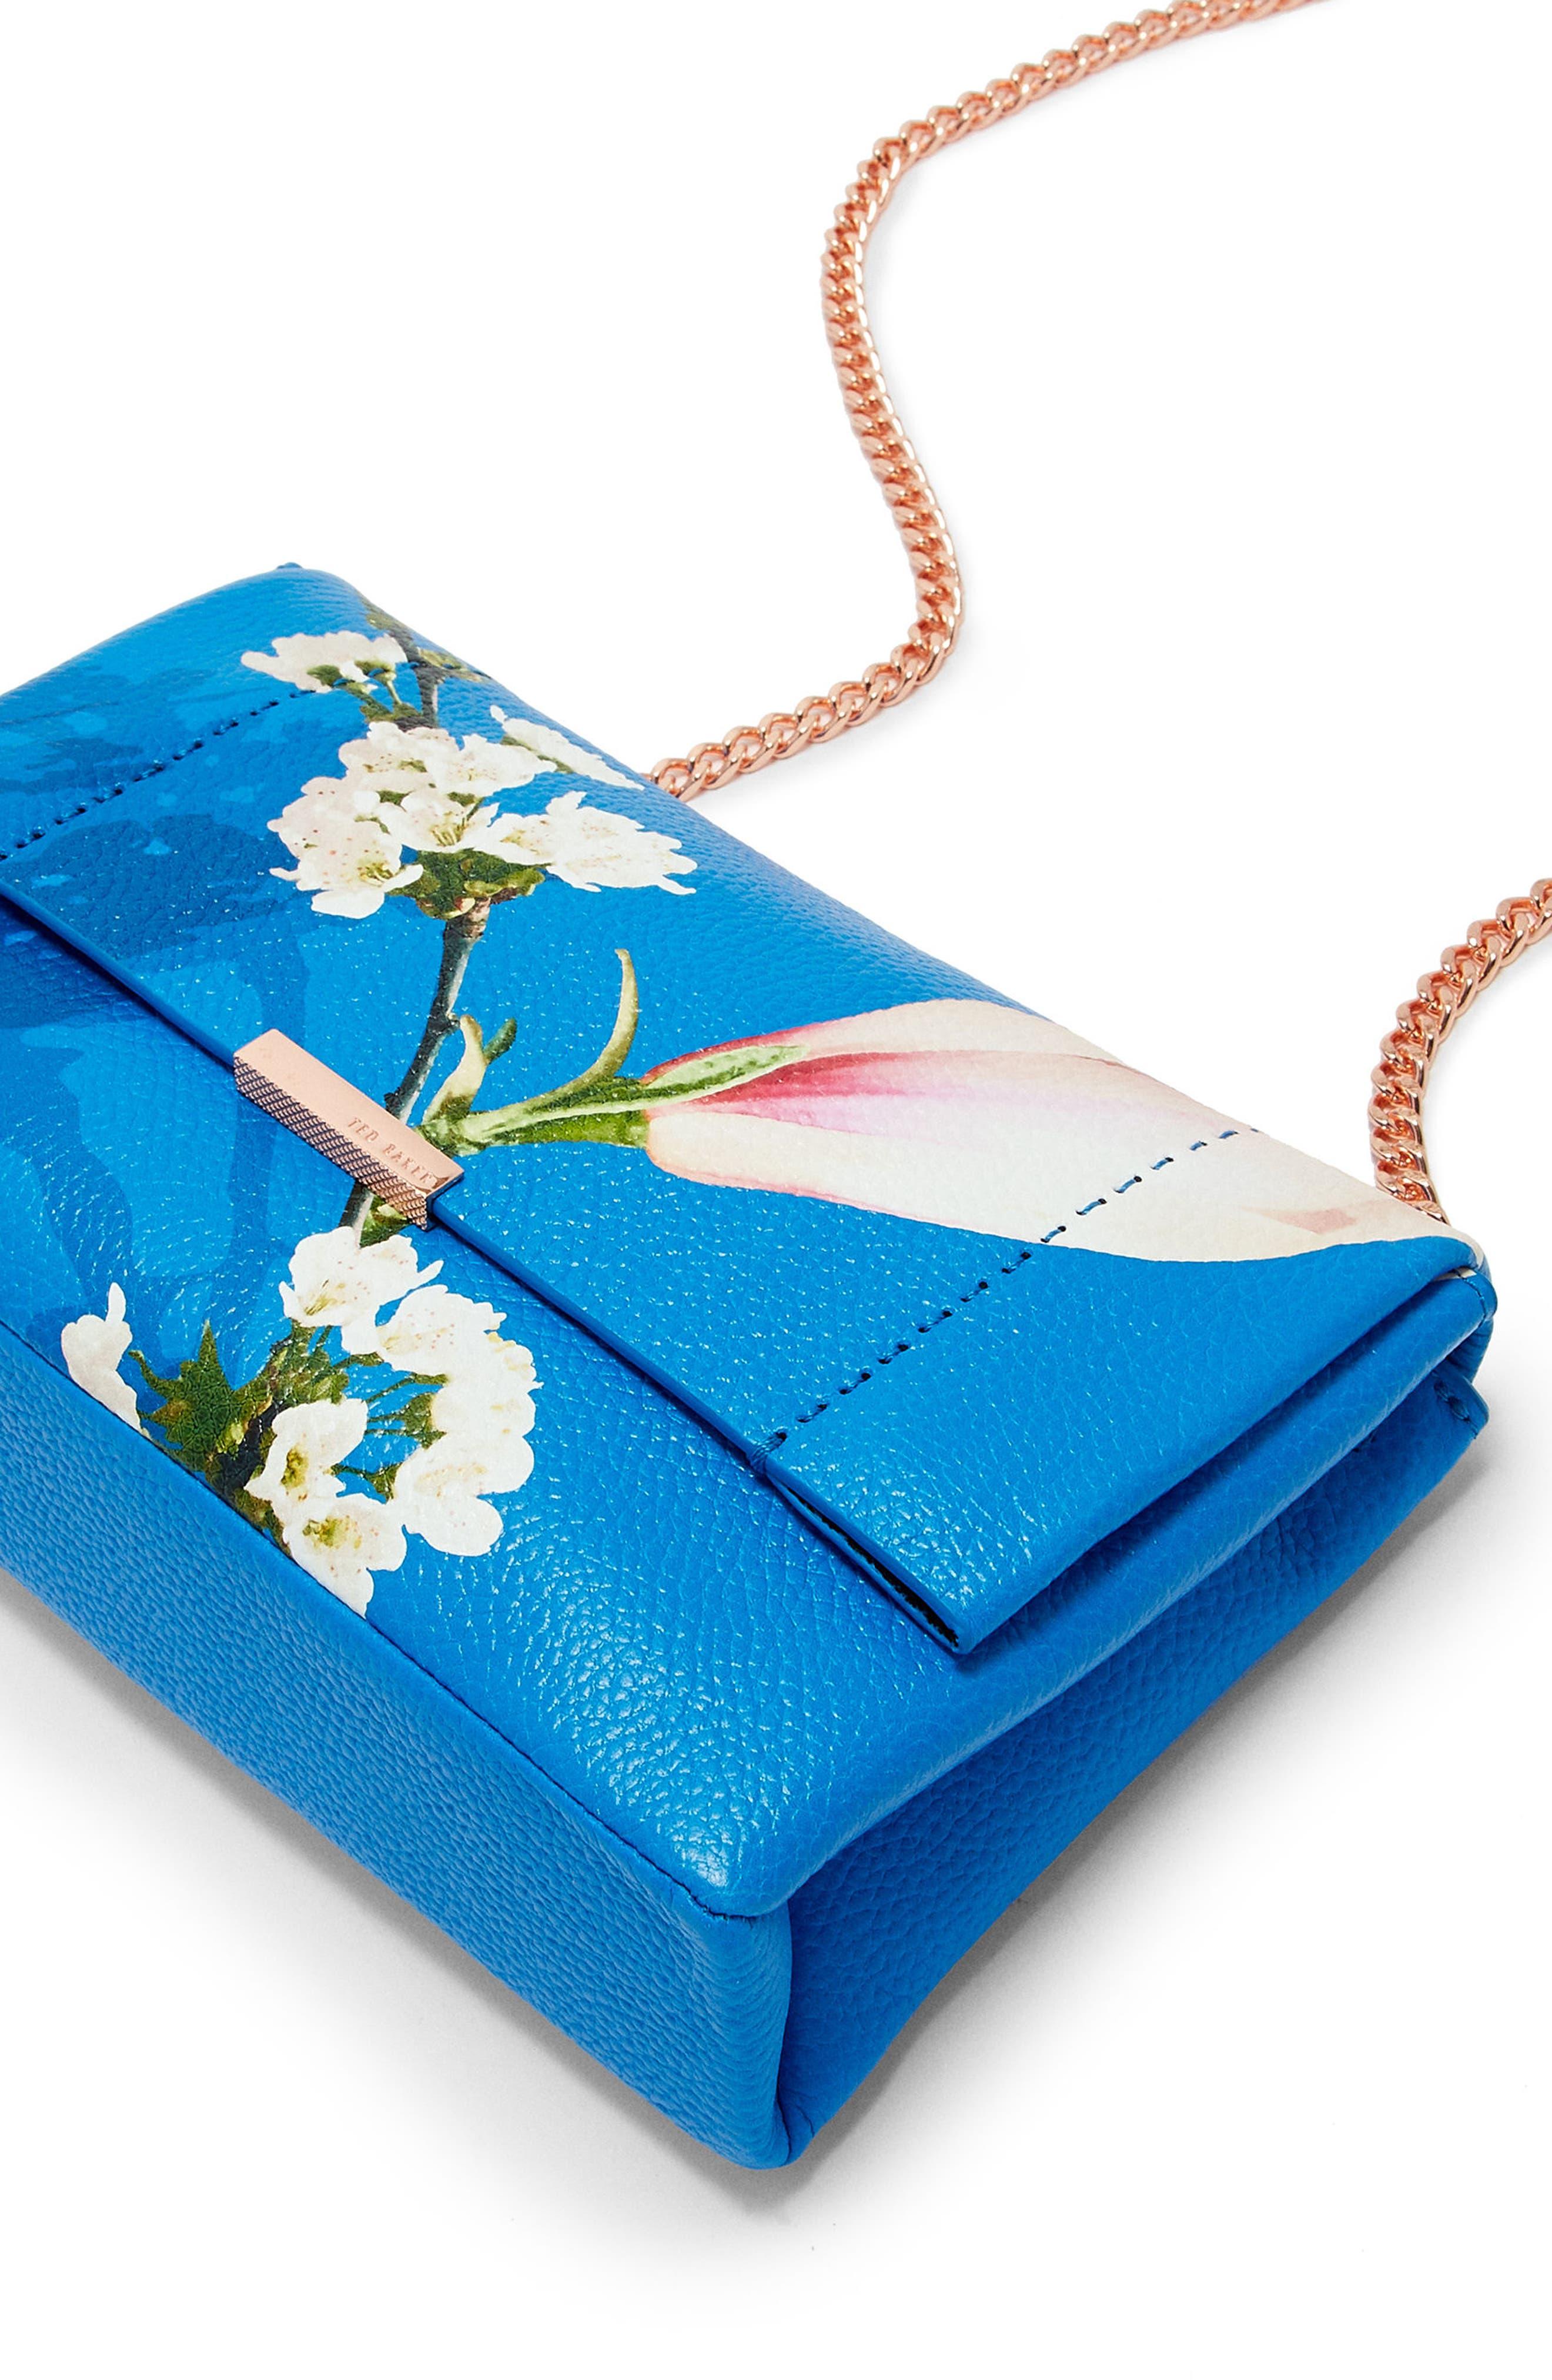 Haalle Harmony Leather Crossbody Bag,                             Alternate thumbnail 4, color,                             Bright Blue